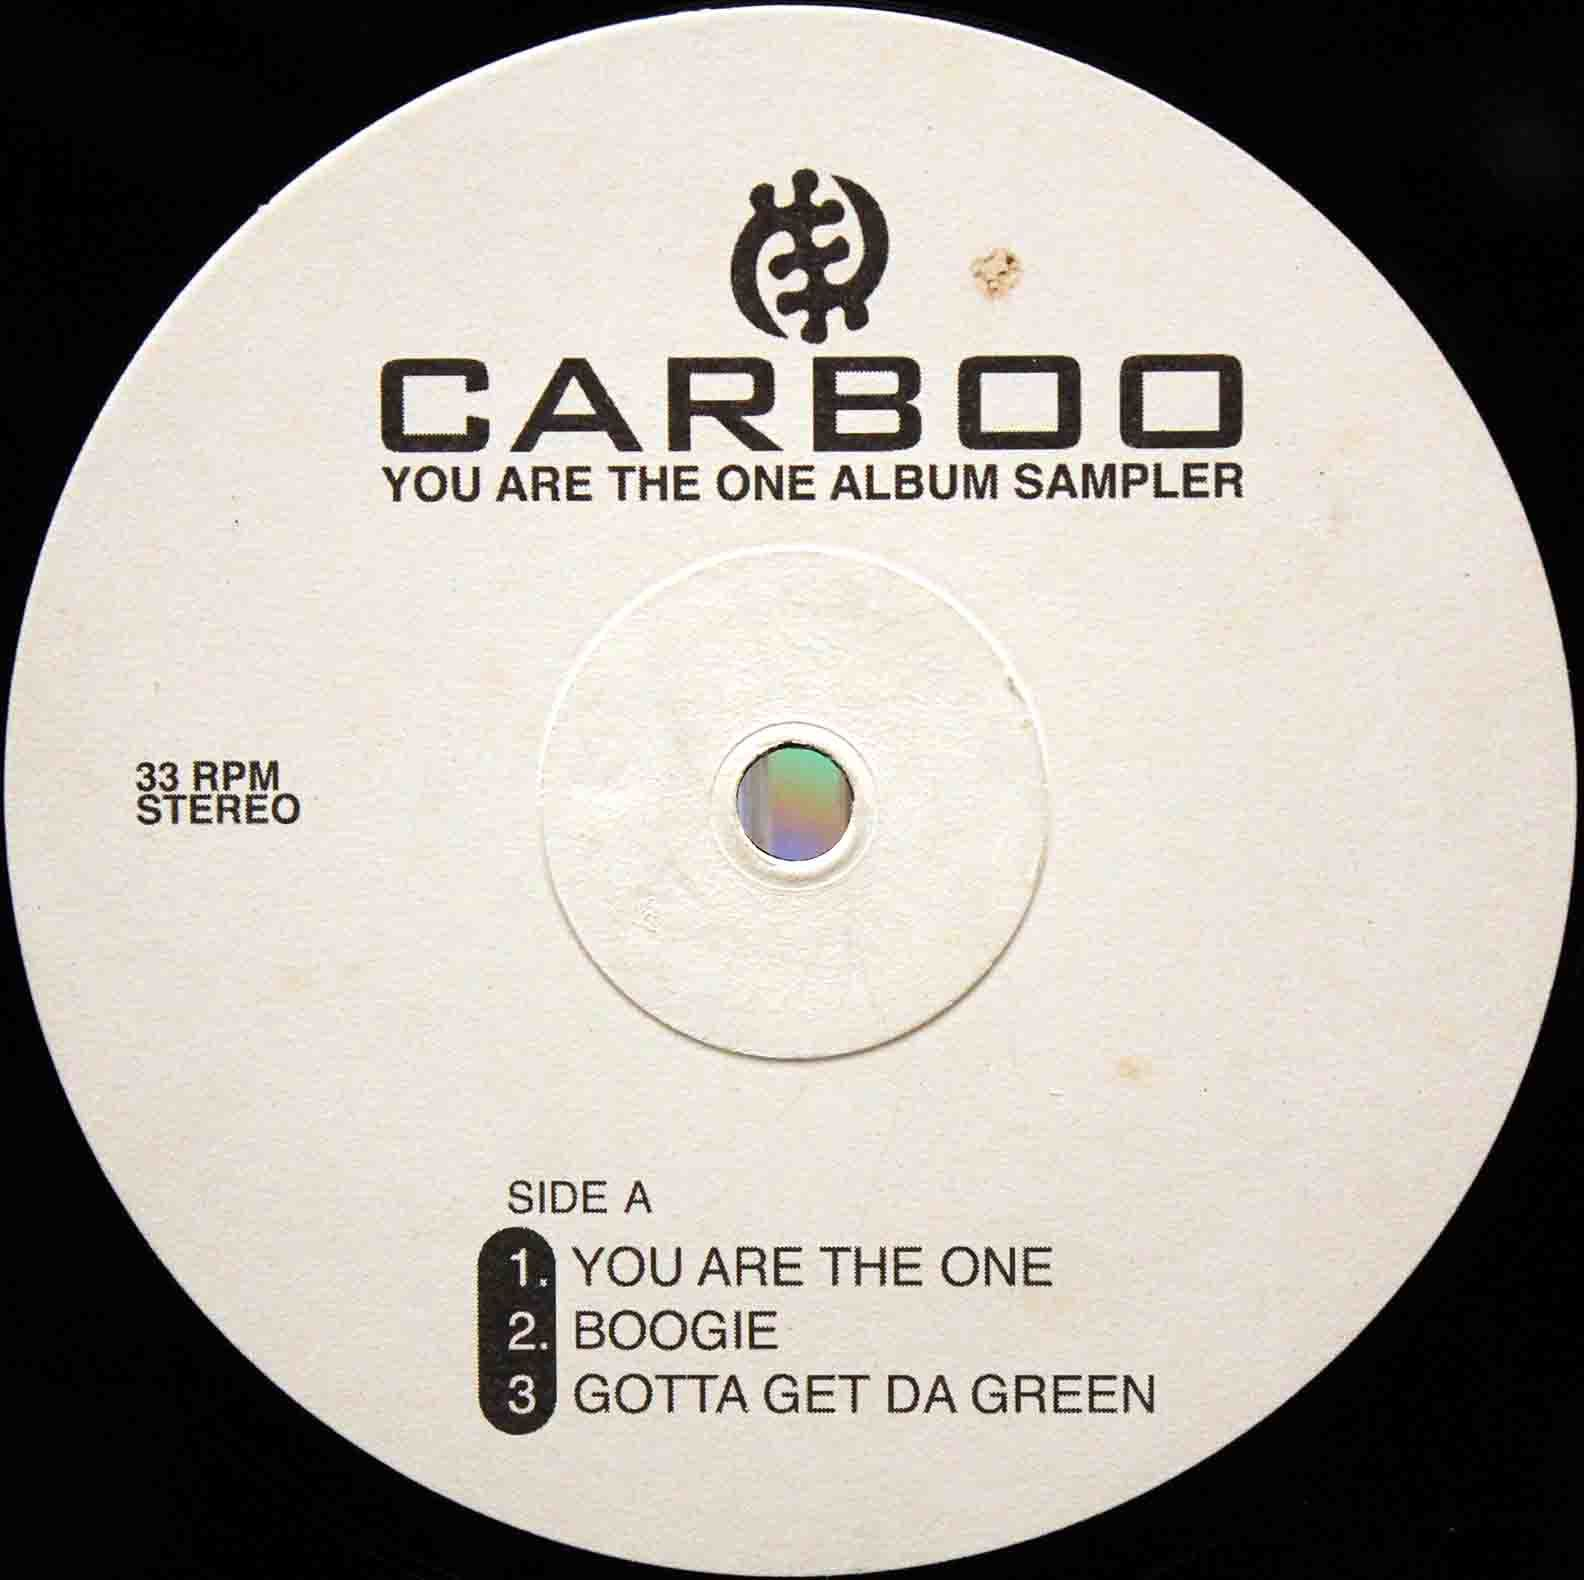 carboo Promo 12 03